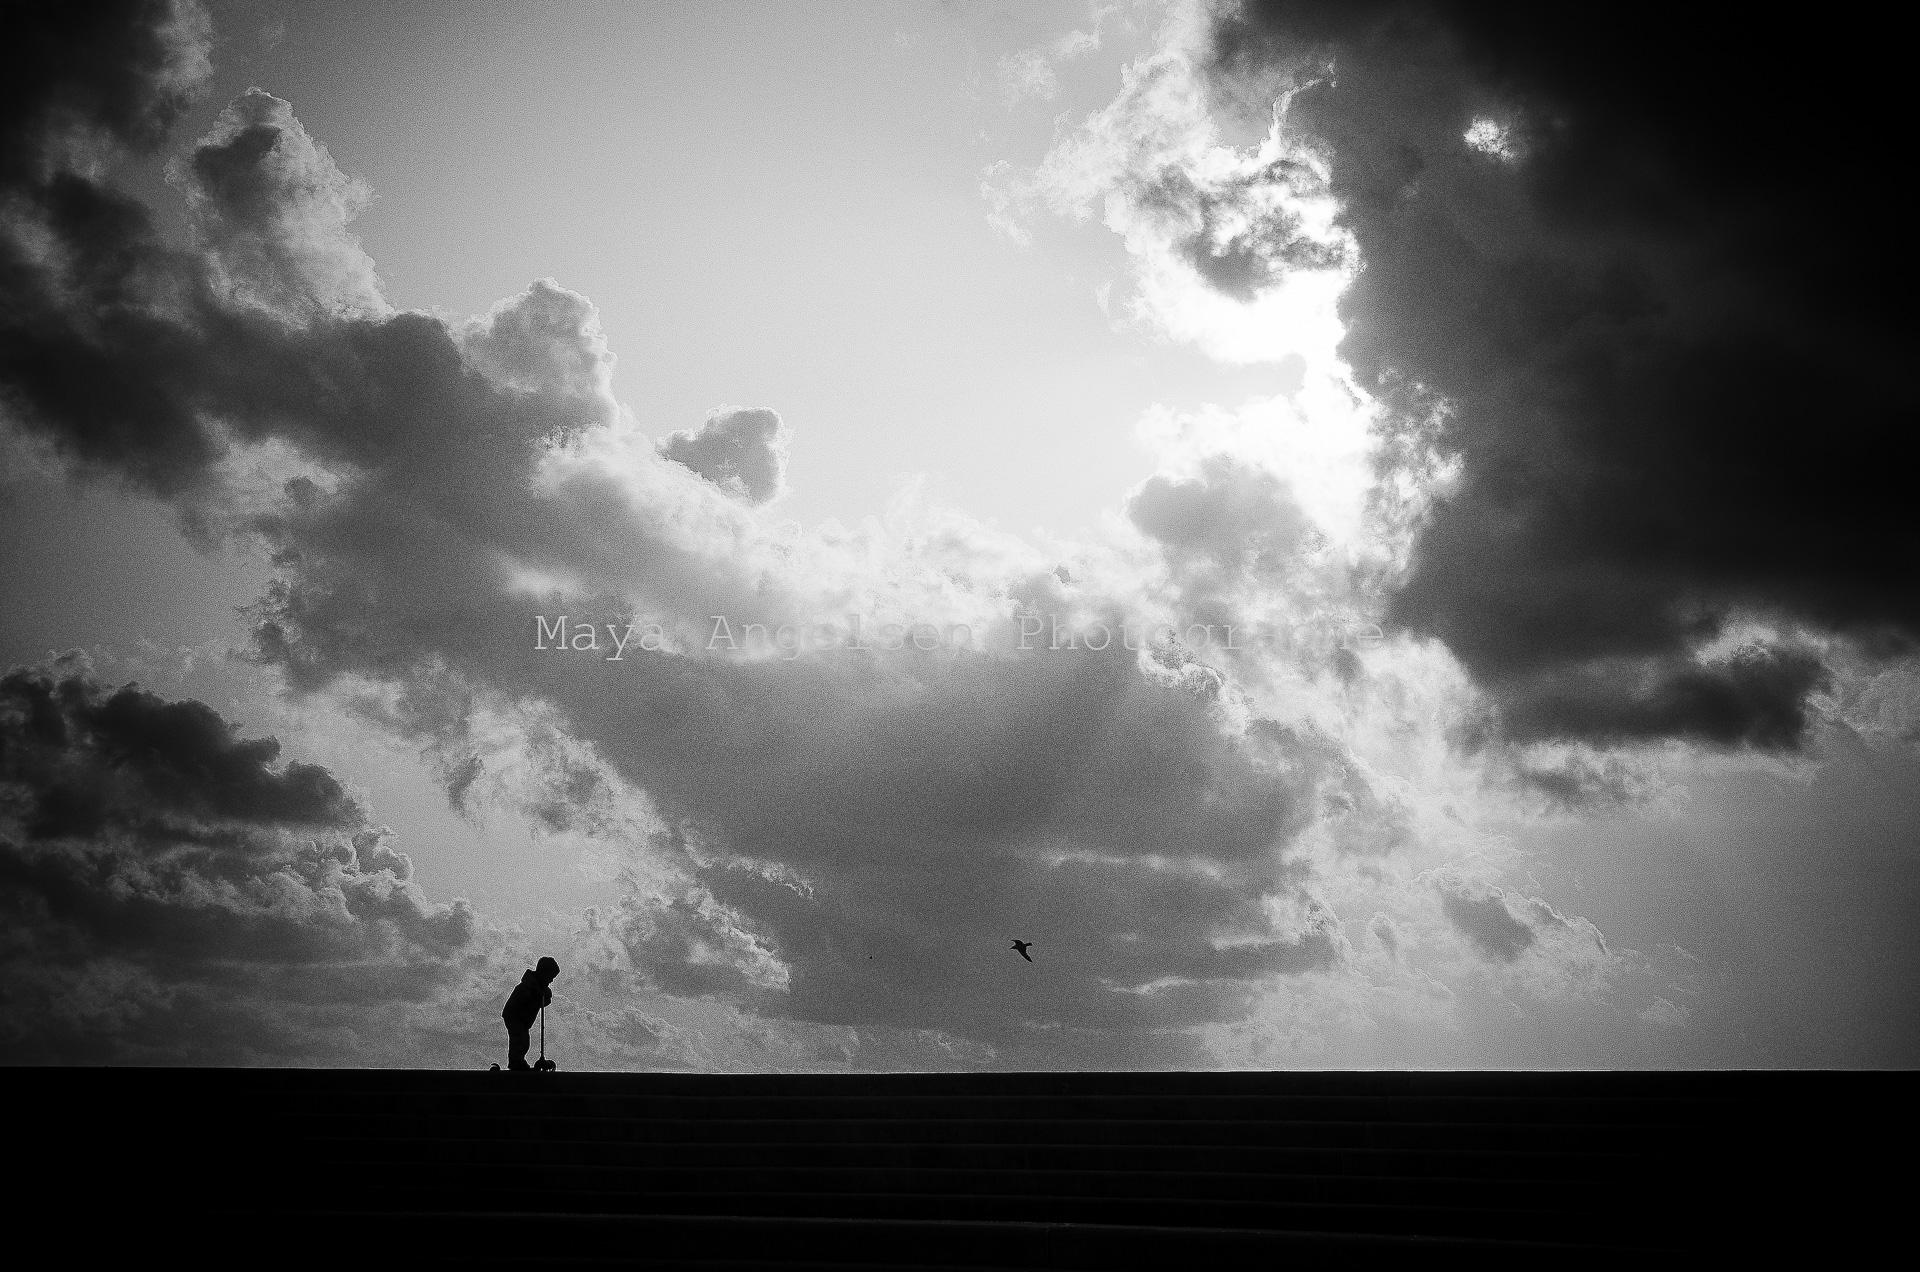 Photographe-streetphoto-maya-angelsen-l-enfant-et-l-oiseau